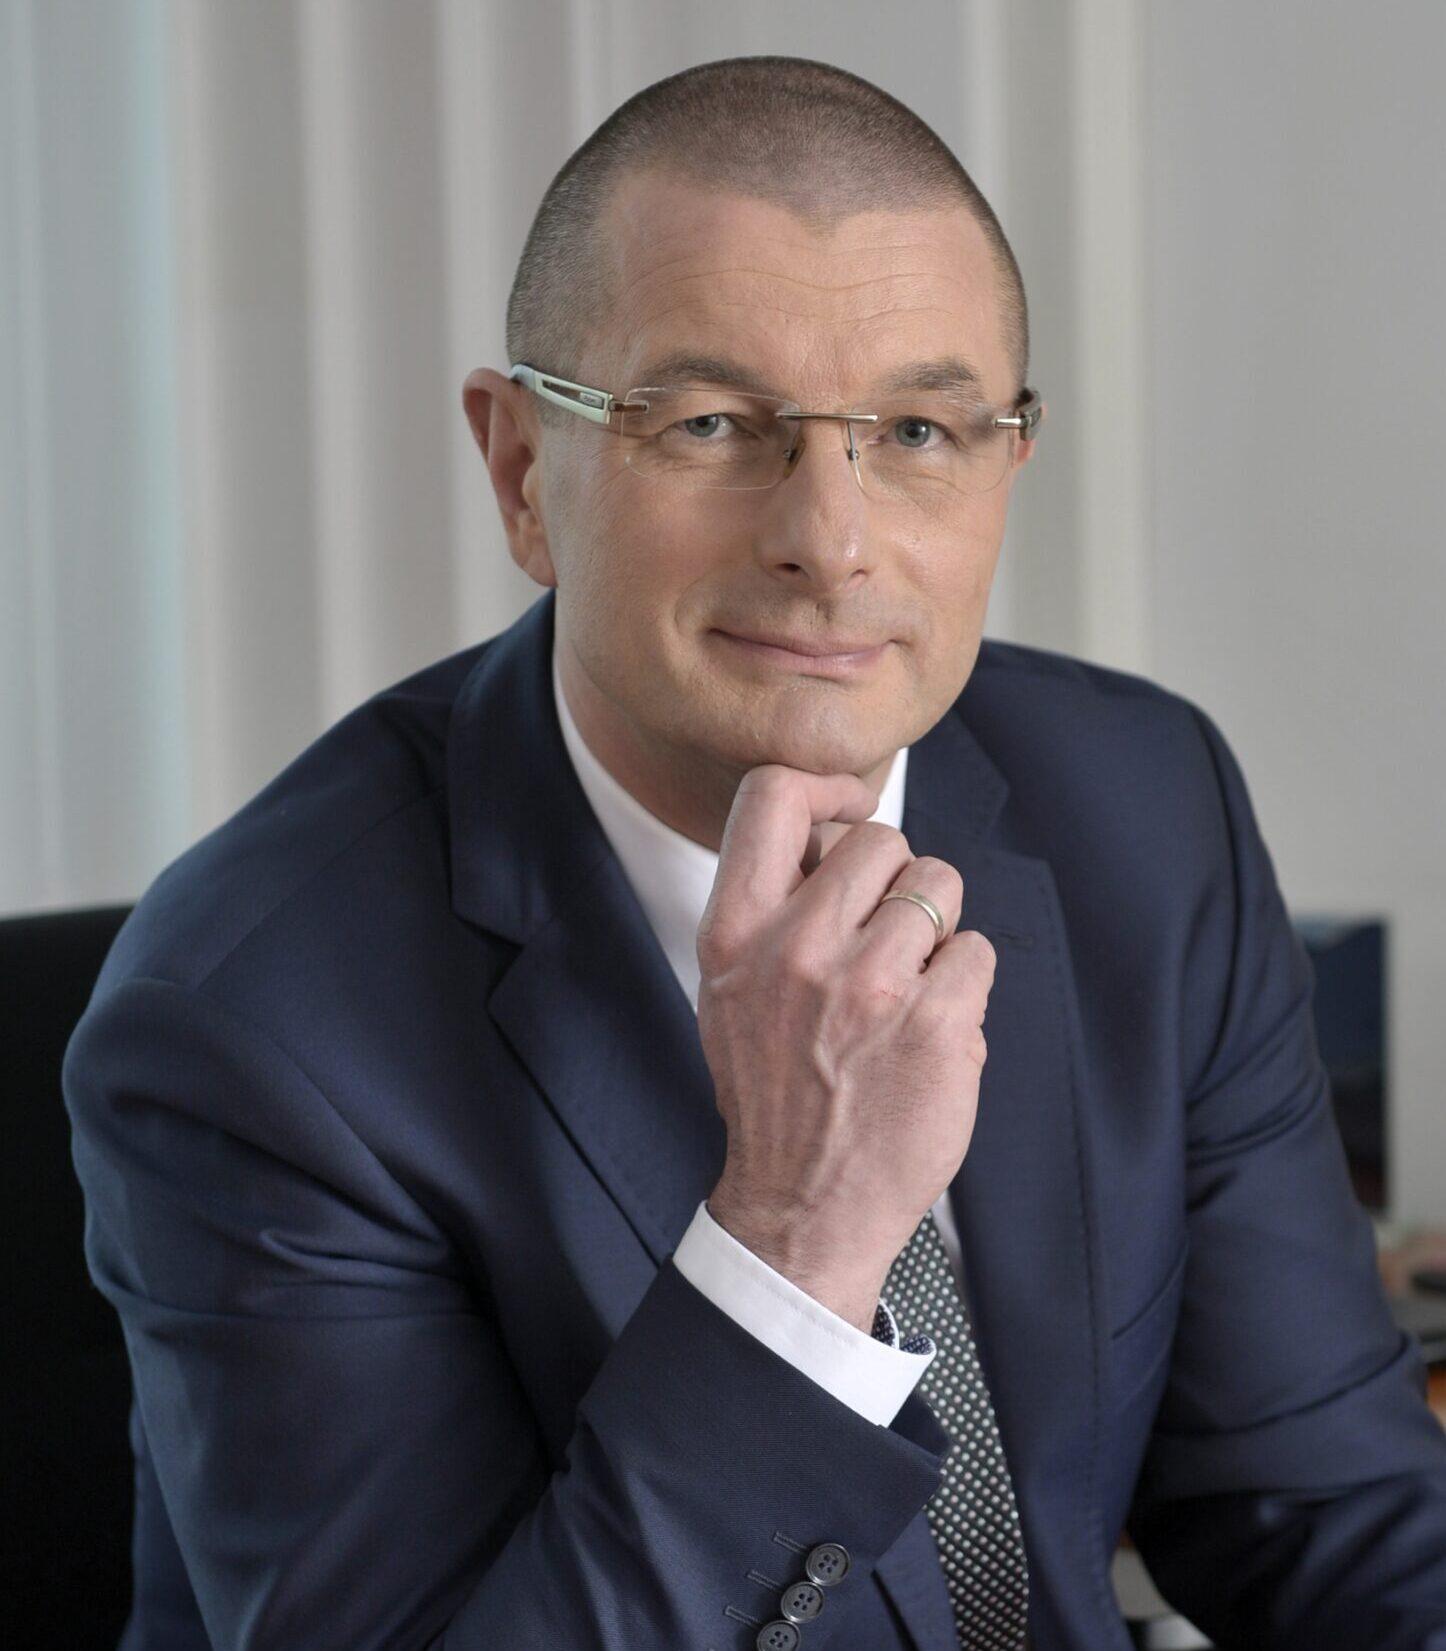 Mirosław Gral